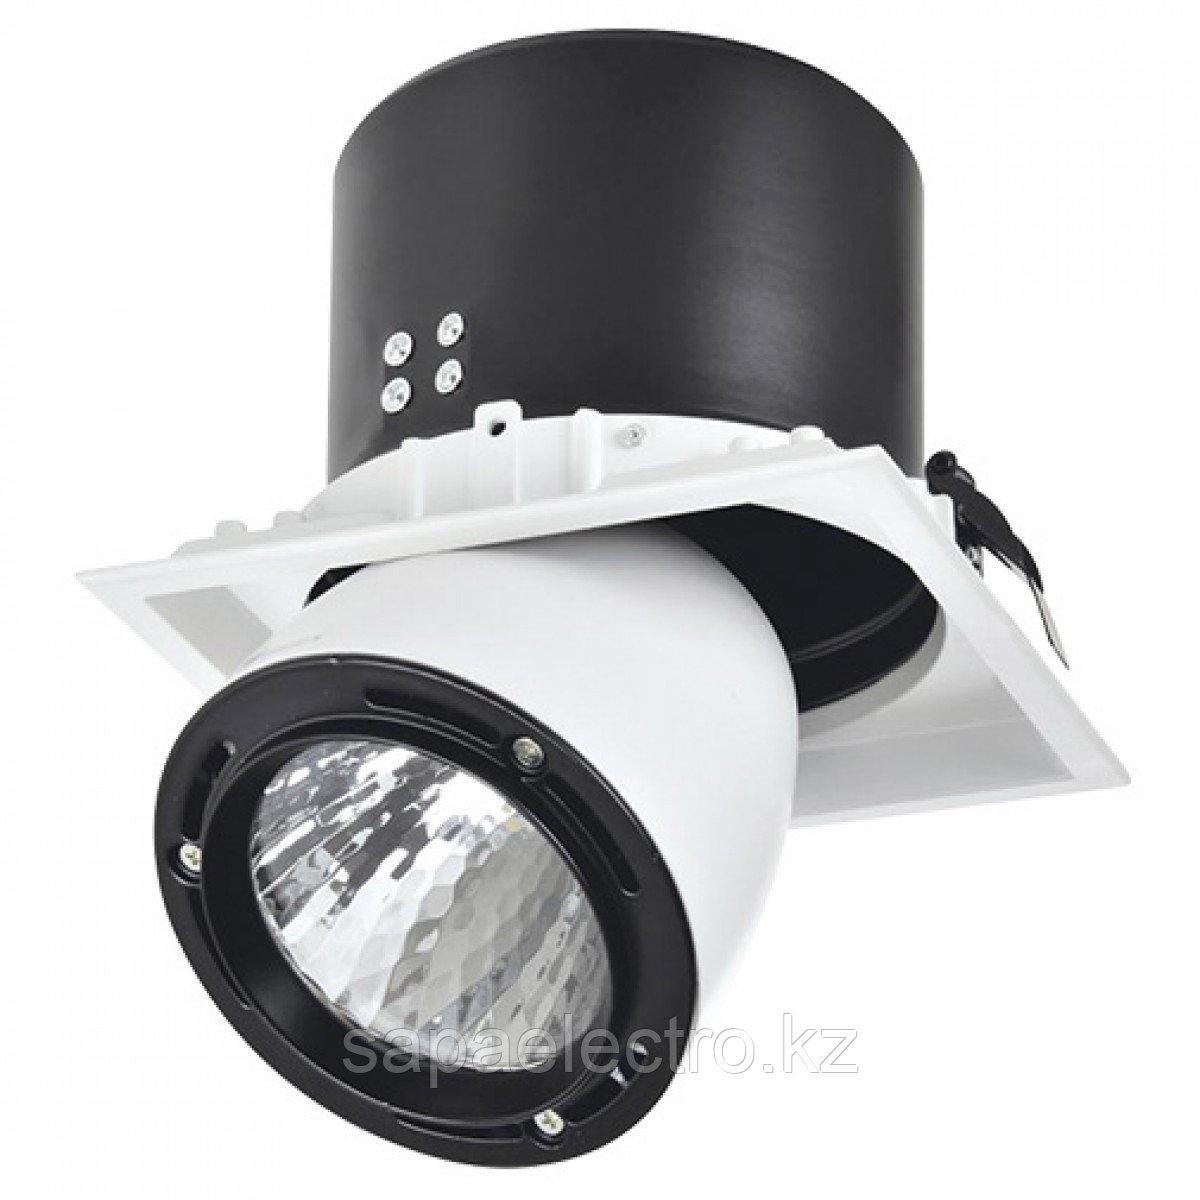 Свет-к DL LED LS-DK917 40W White and Black 5700K(TS